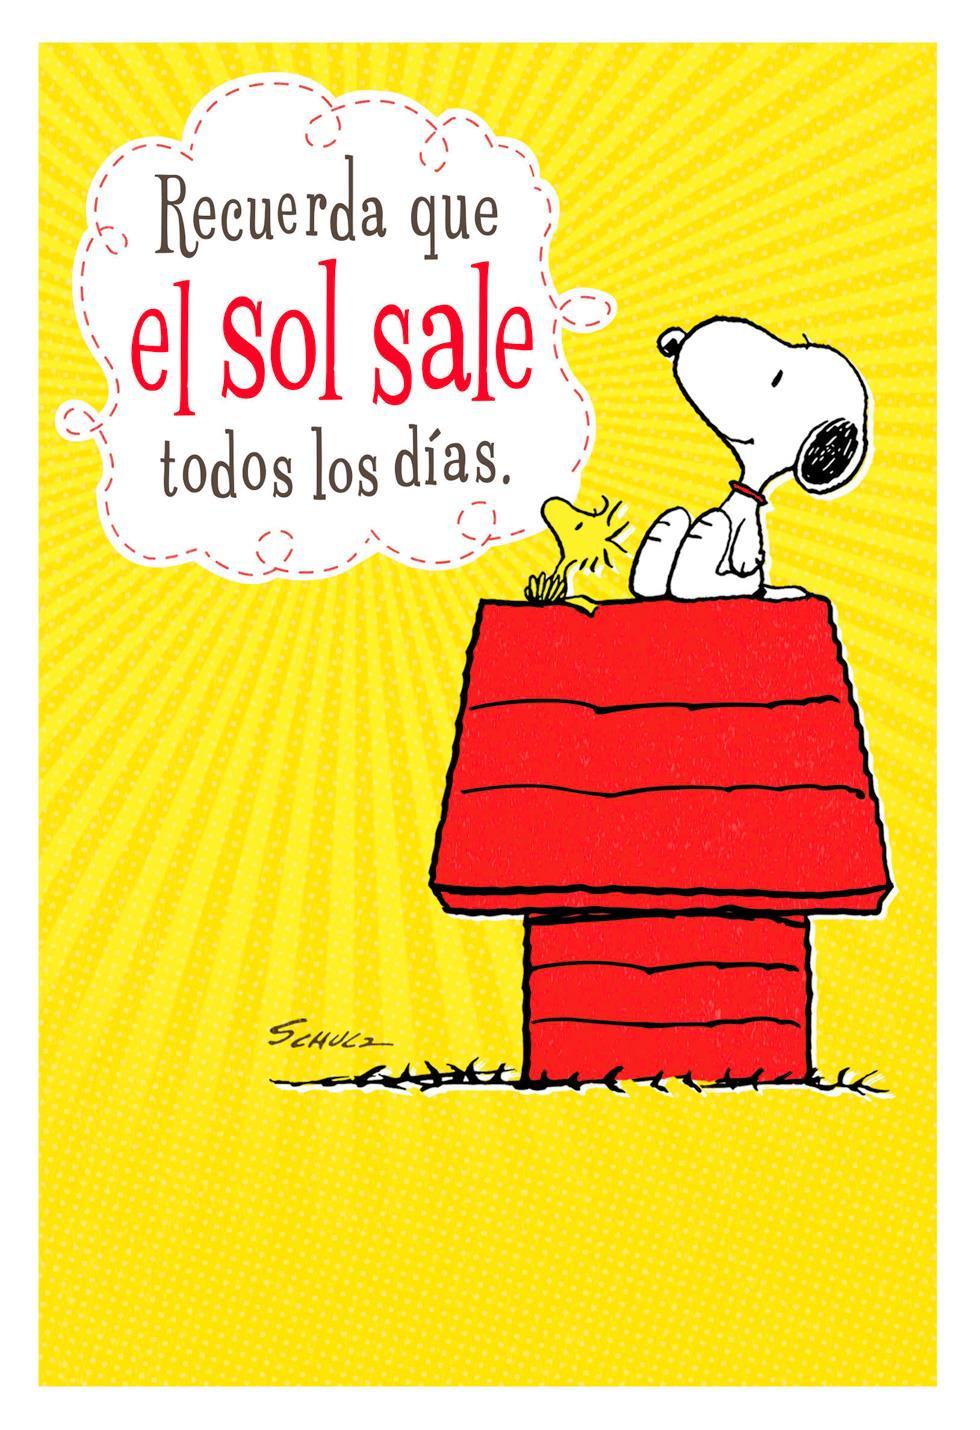 Peanuts Snoopy Spanish Language Encouragement Card